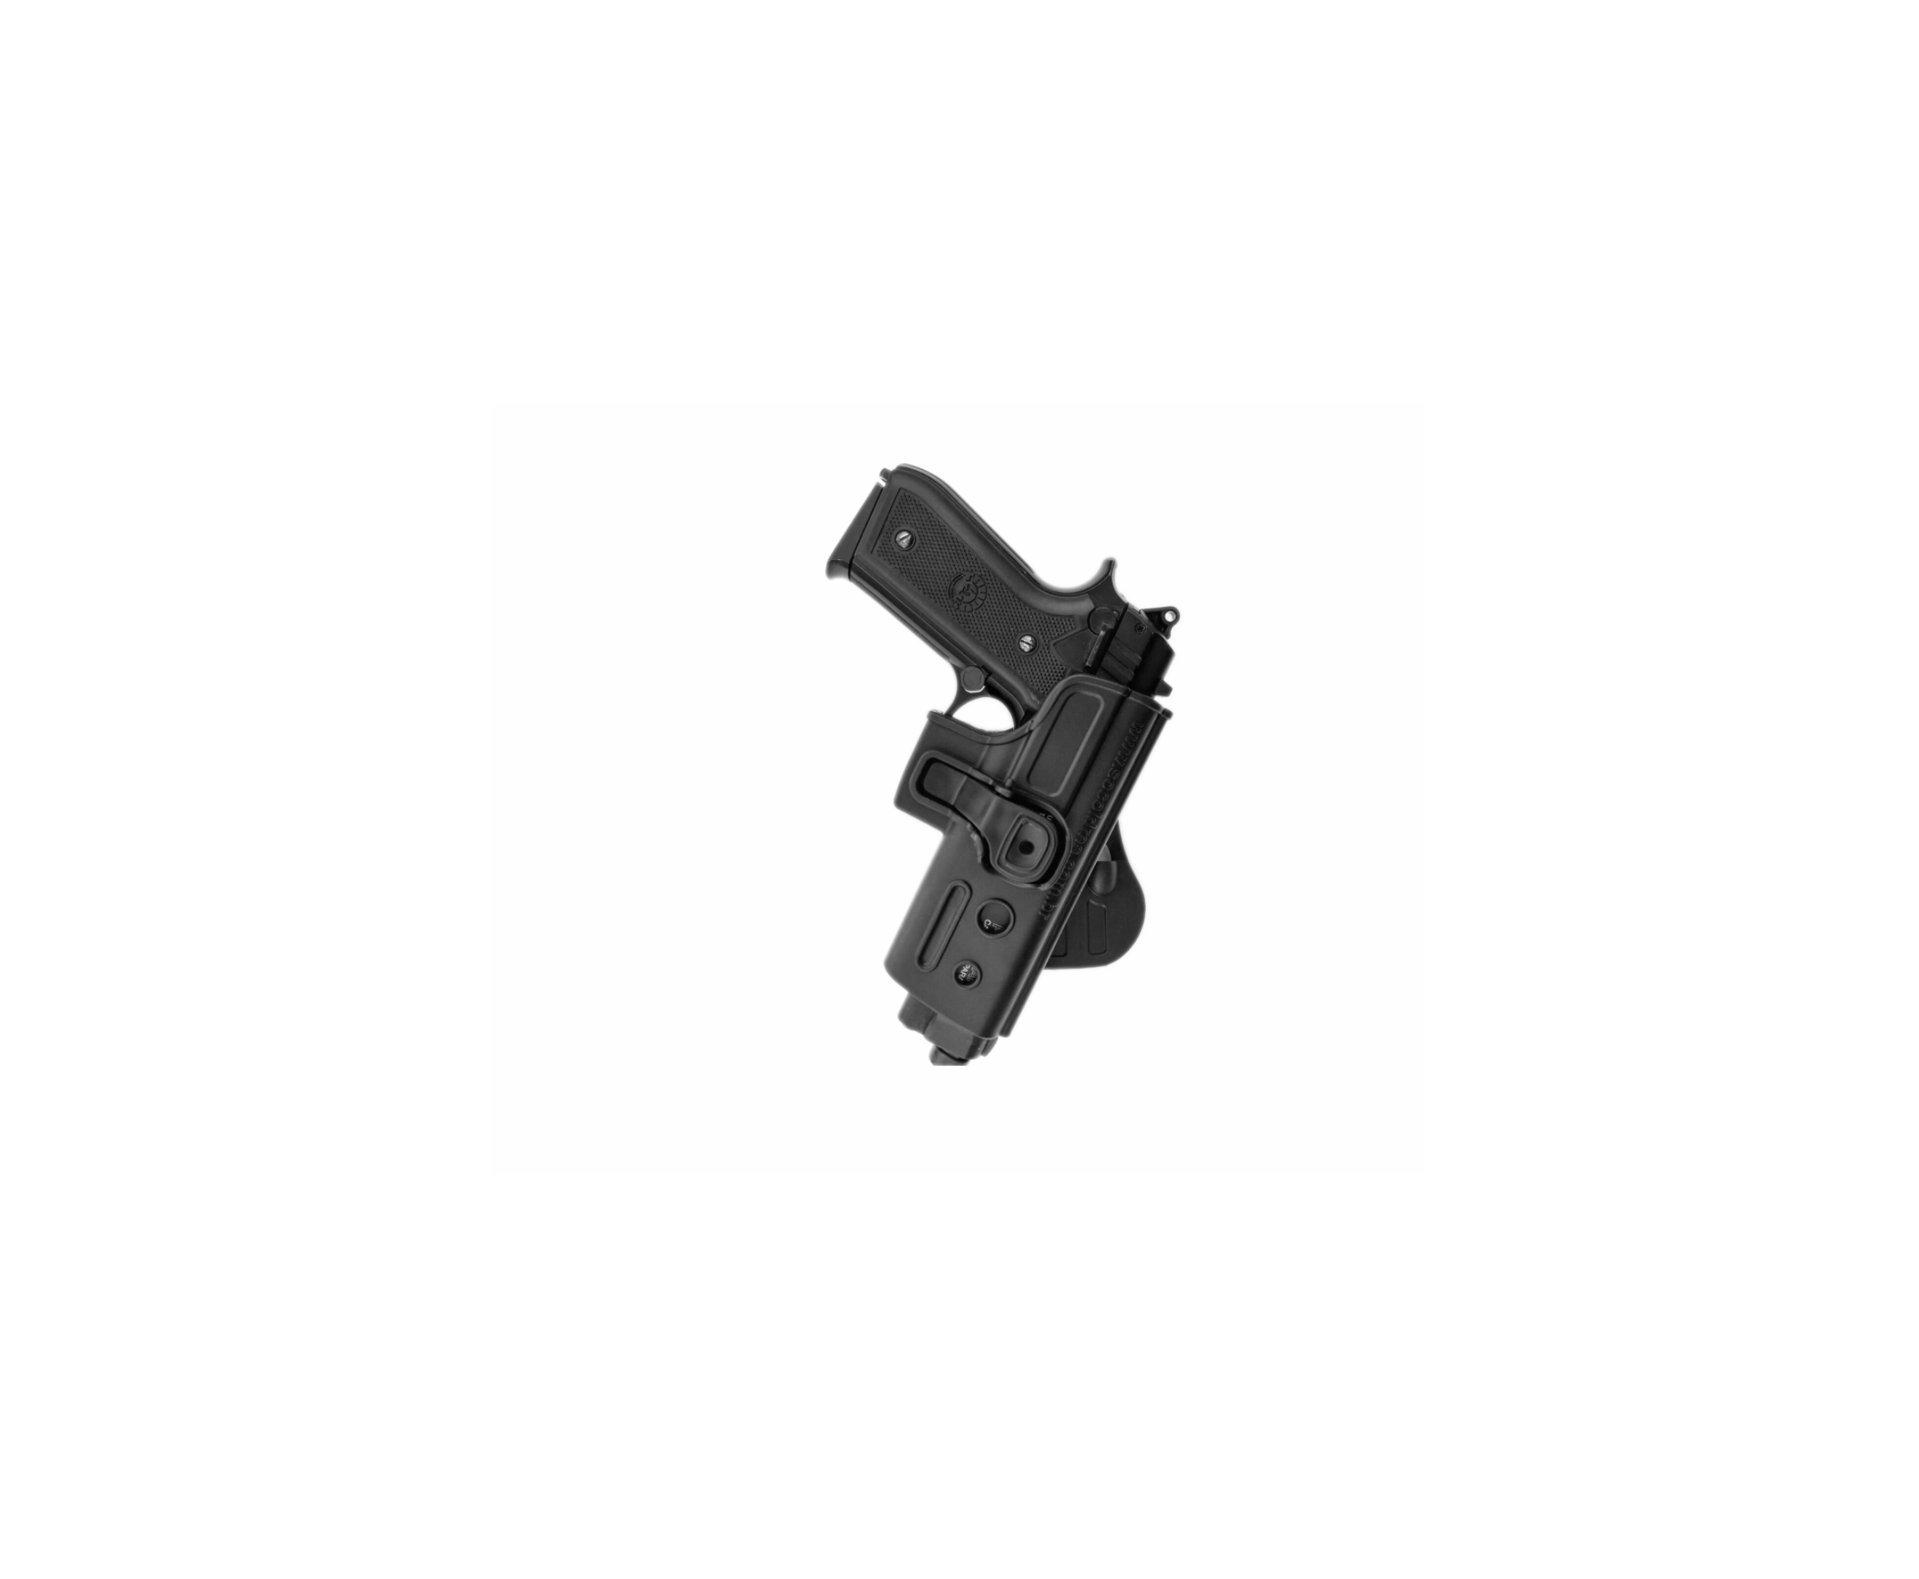 Coldre Apolo So Coldres Para Pistolas Taurus, Imbel E Glock  - Destro